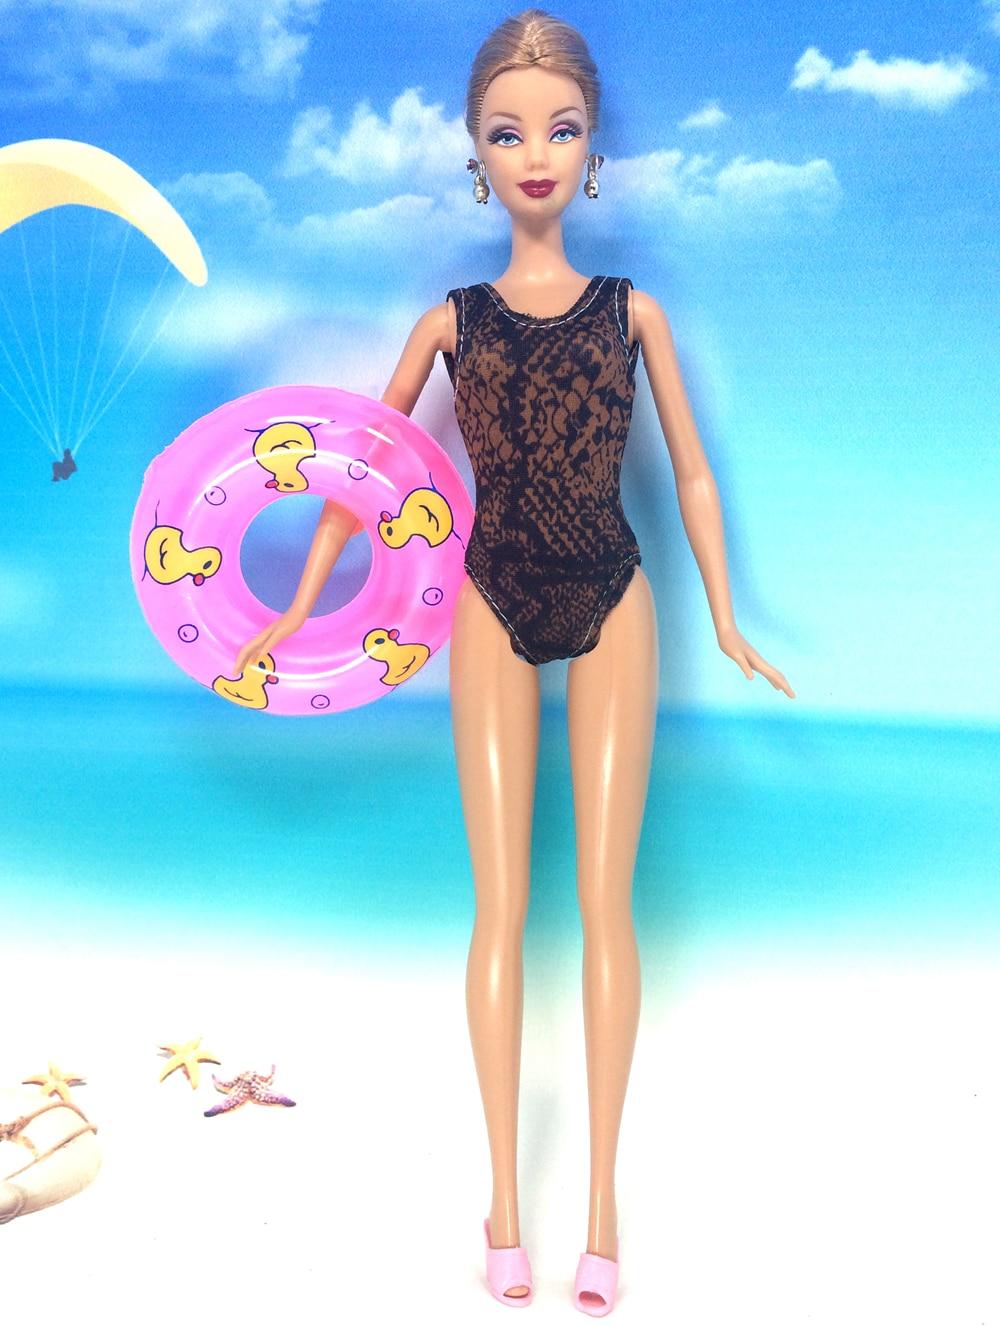 NK Doll Swimwear Seashore Bathing Garments Bikini Swimsuit+Slippers+Swimming Buoy Lifebelt Ring For Barbie Doll Greatest Woman' Reward 007A